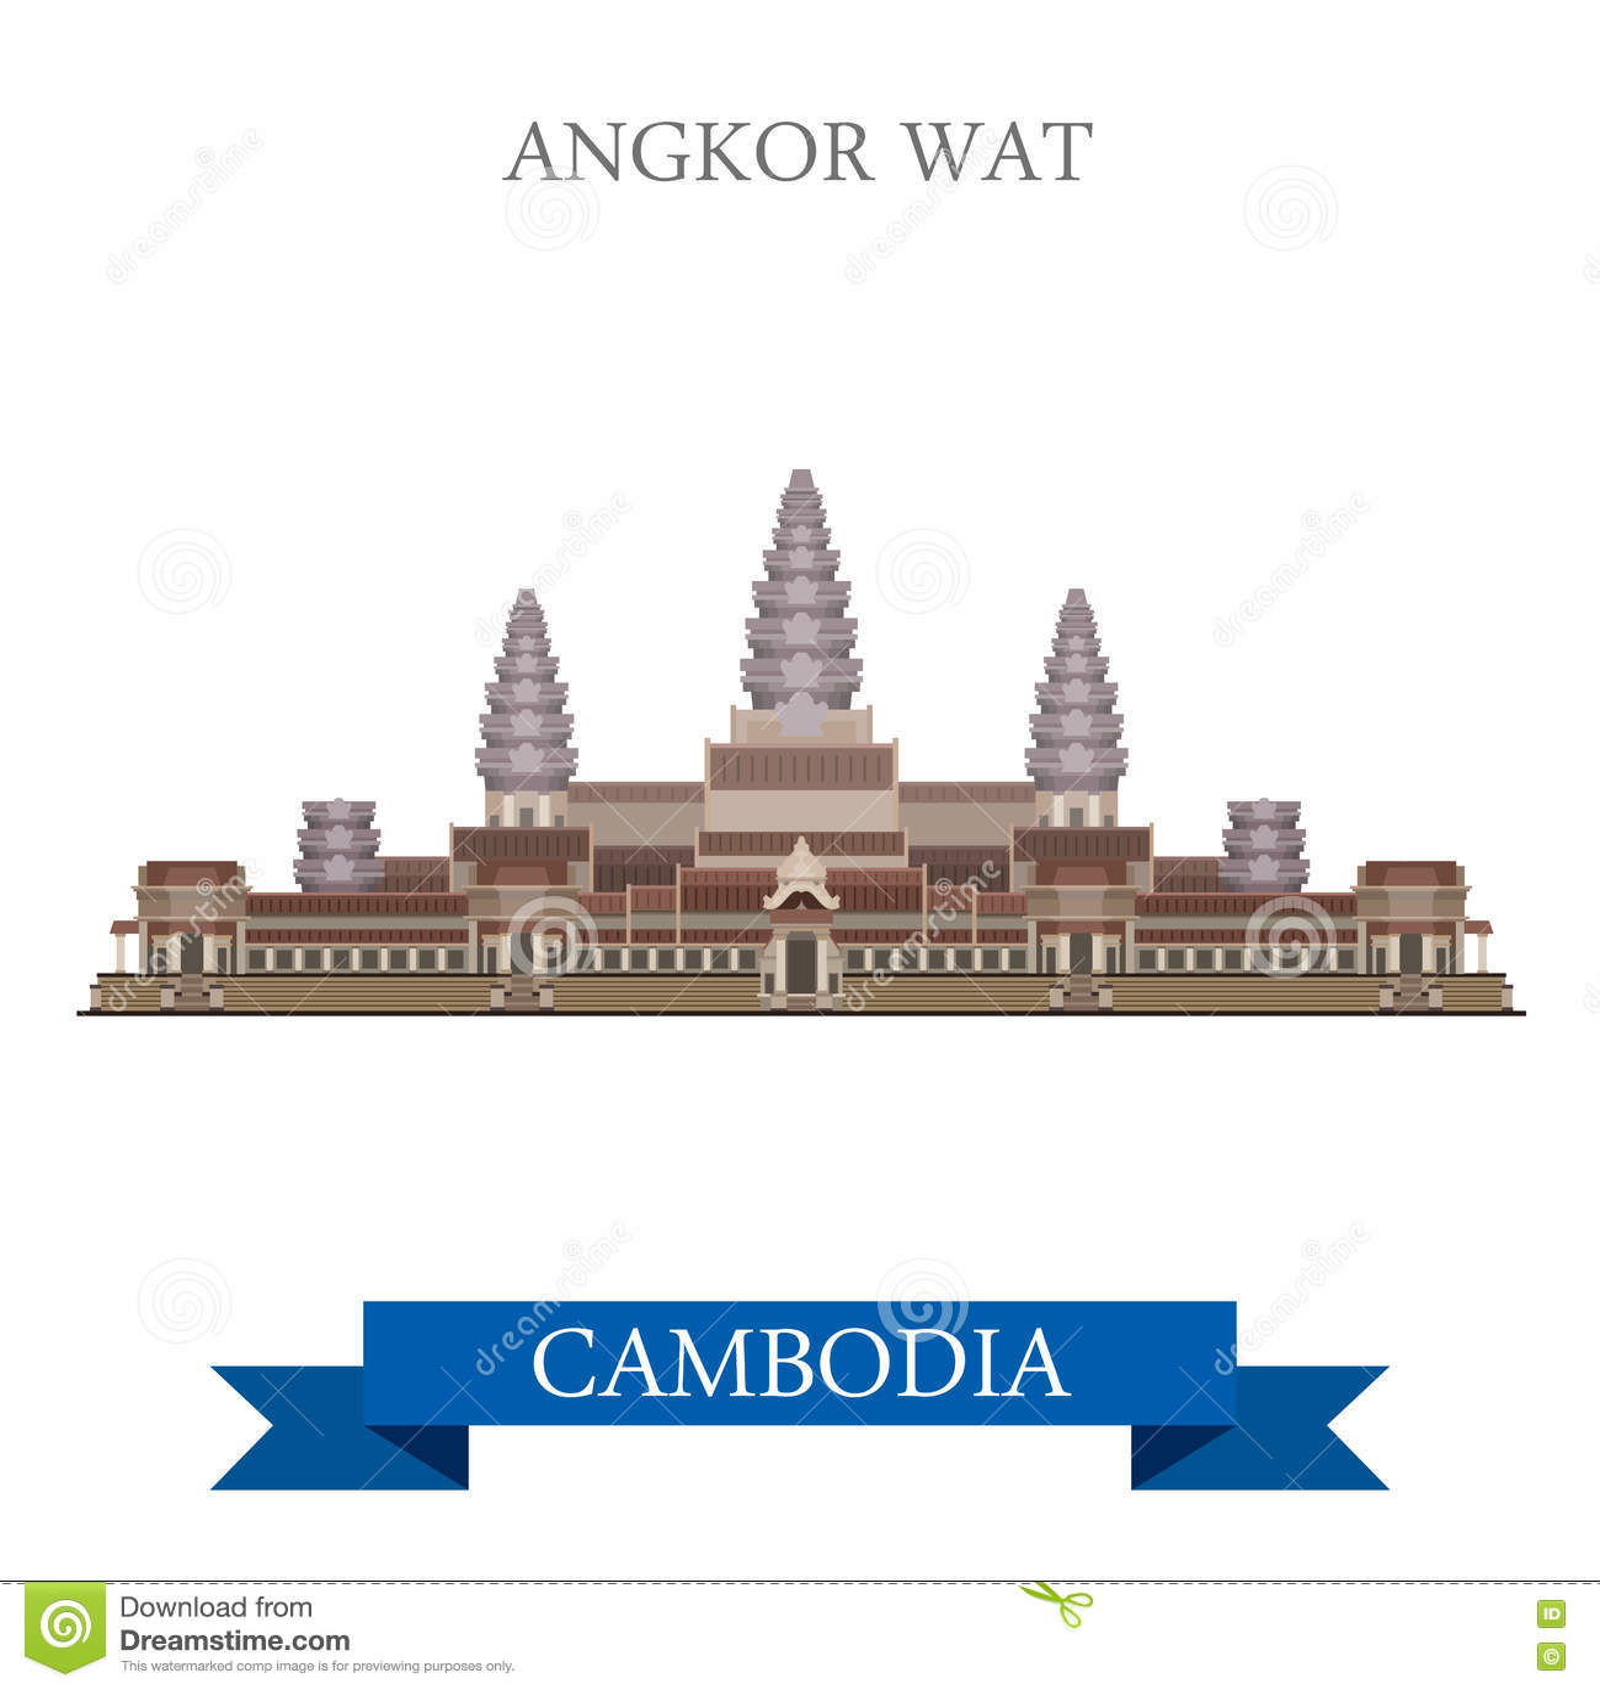 Angkor wat pictures download.